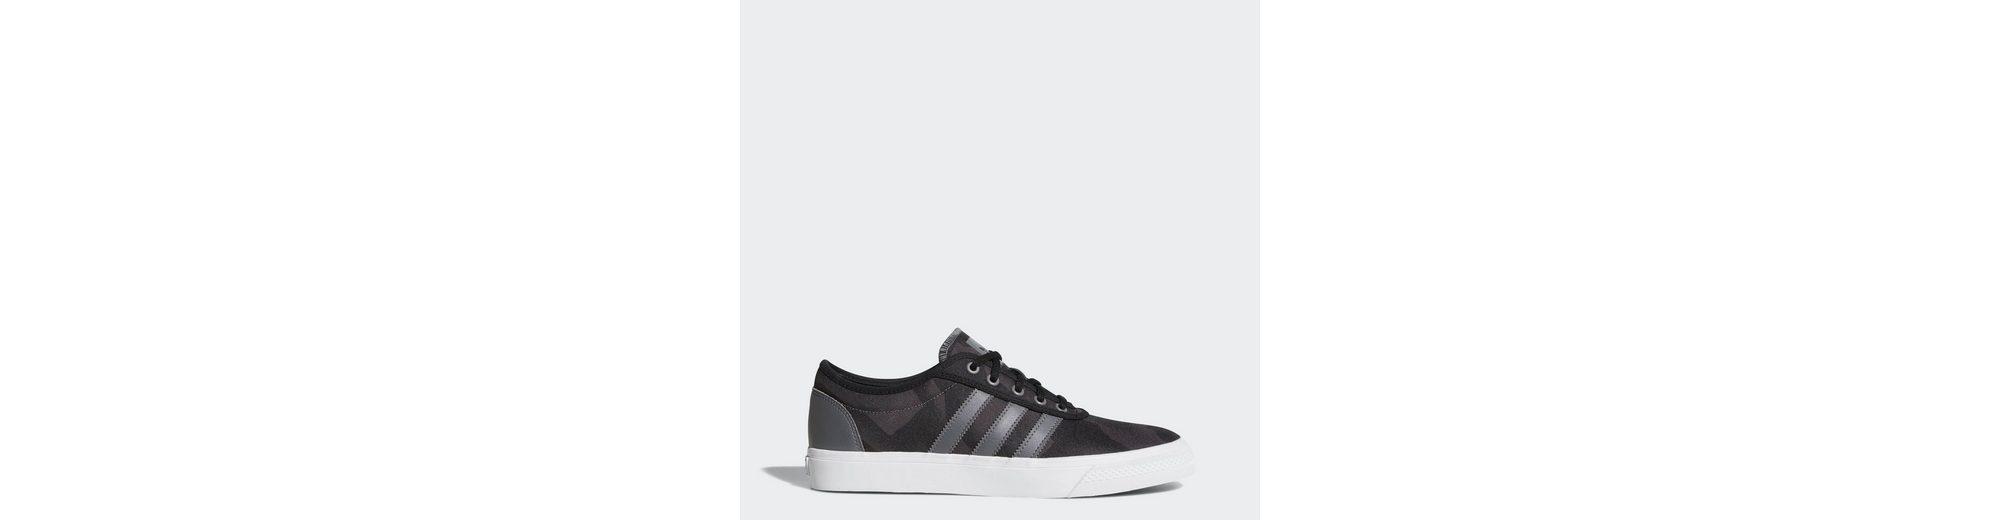 adidas Originals Adiease Schuh Skateschuh